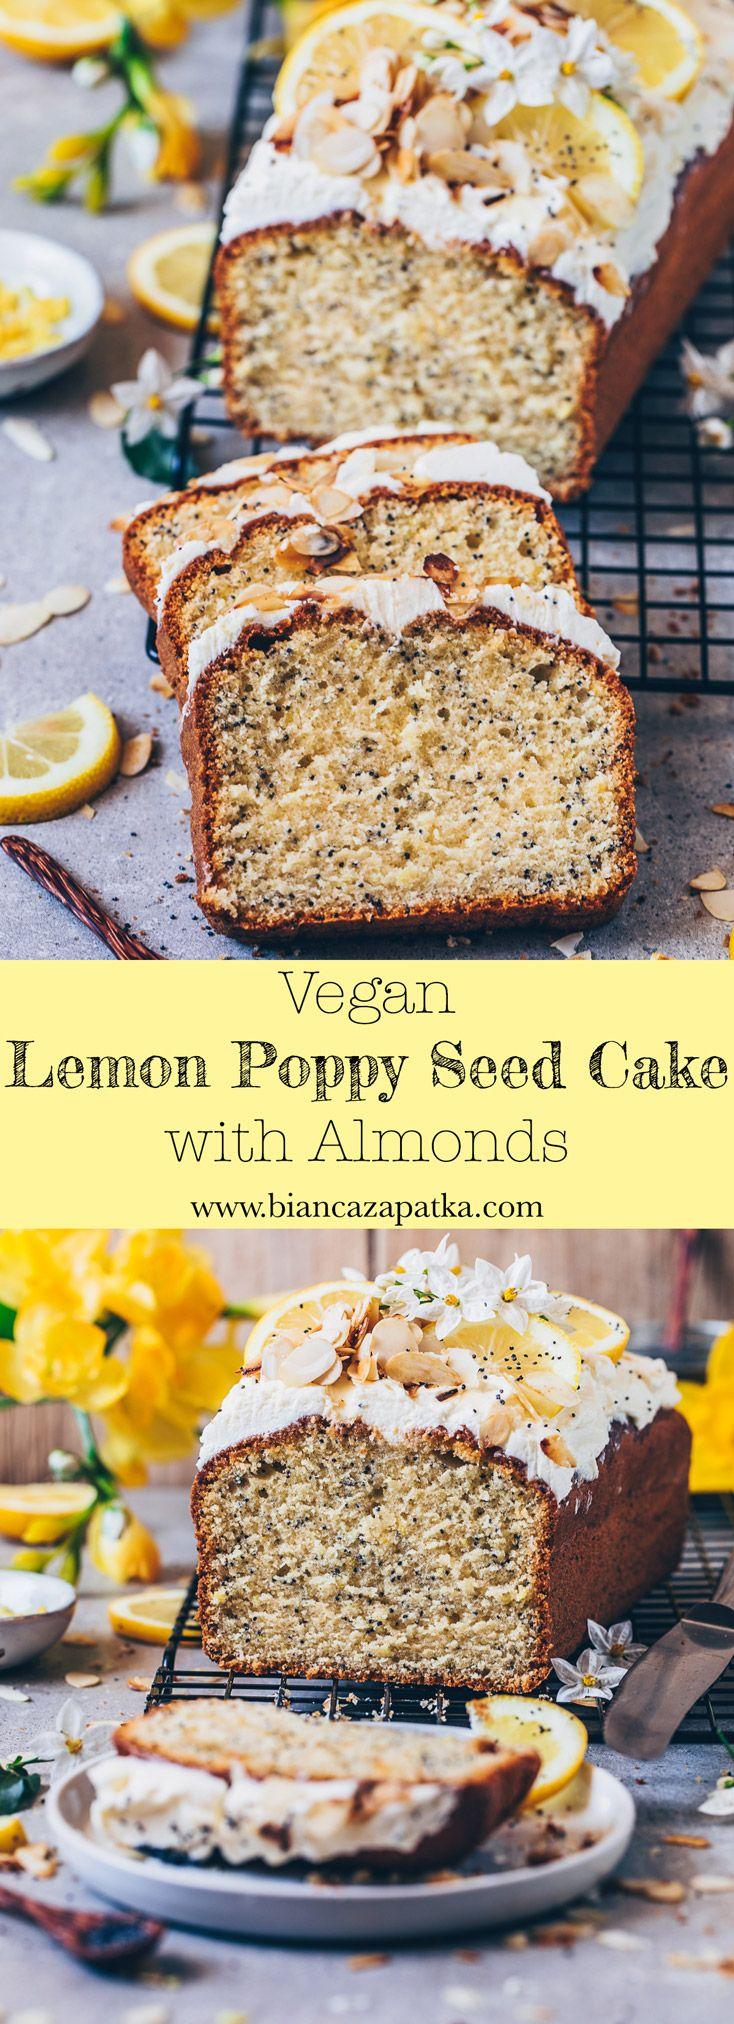 Lemon Poppy Seed Cake - Vegan - Bianca Zapatka | Recipes #lemoncreamcheesefrosting